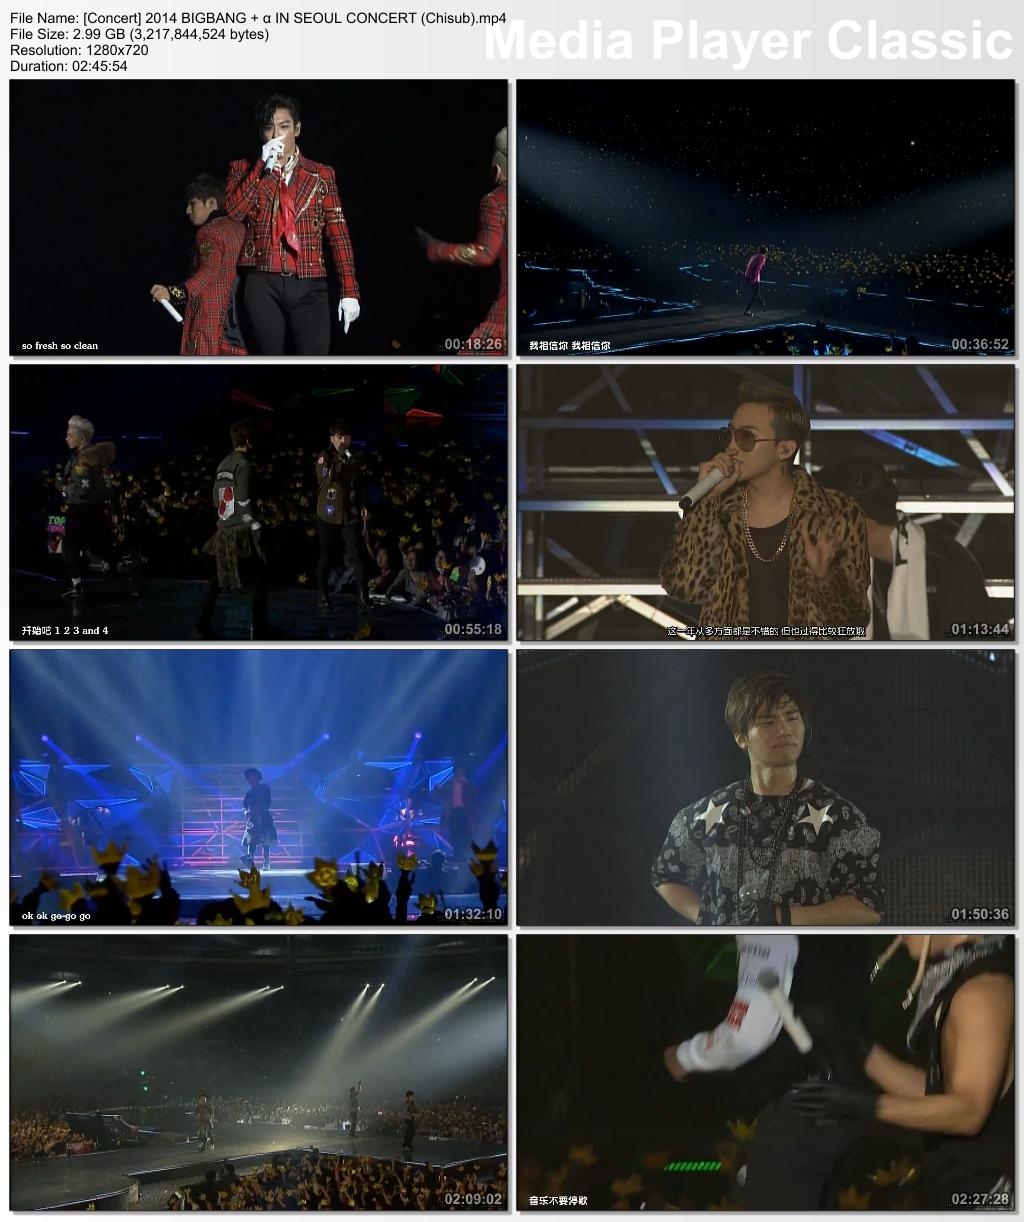 [Concert] 2014 BIGBANG + α IN SEOUL CONCERT (Chisub)